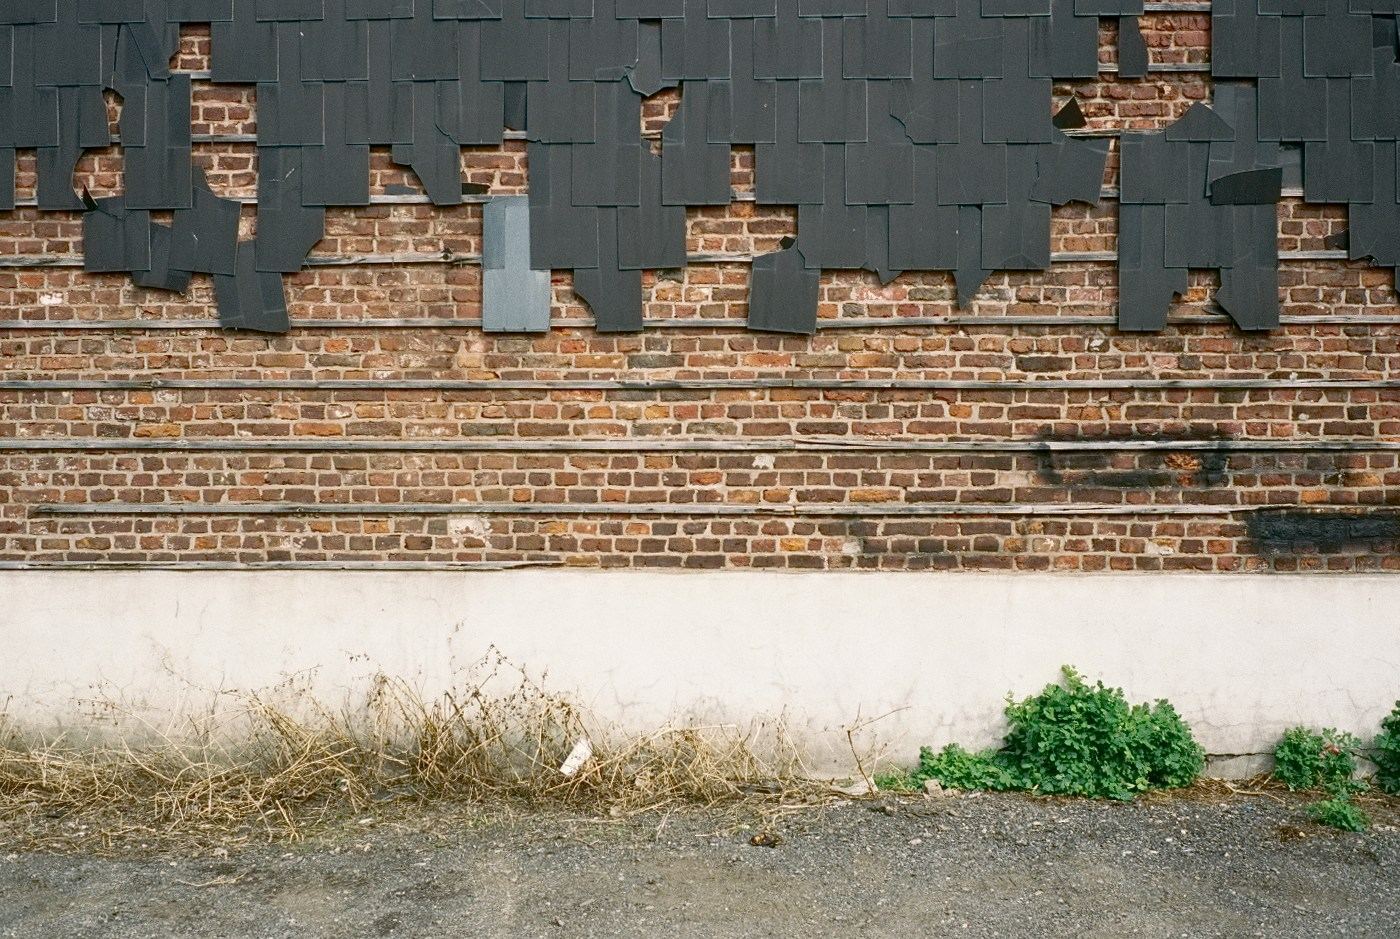 000039JoergBergs-KodakPortra400-MeinFilmLab-M7-35